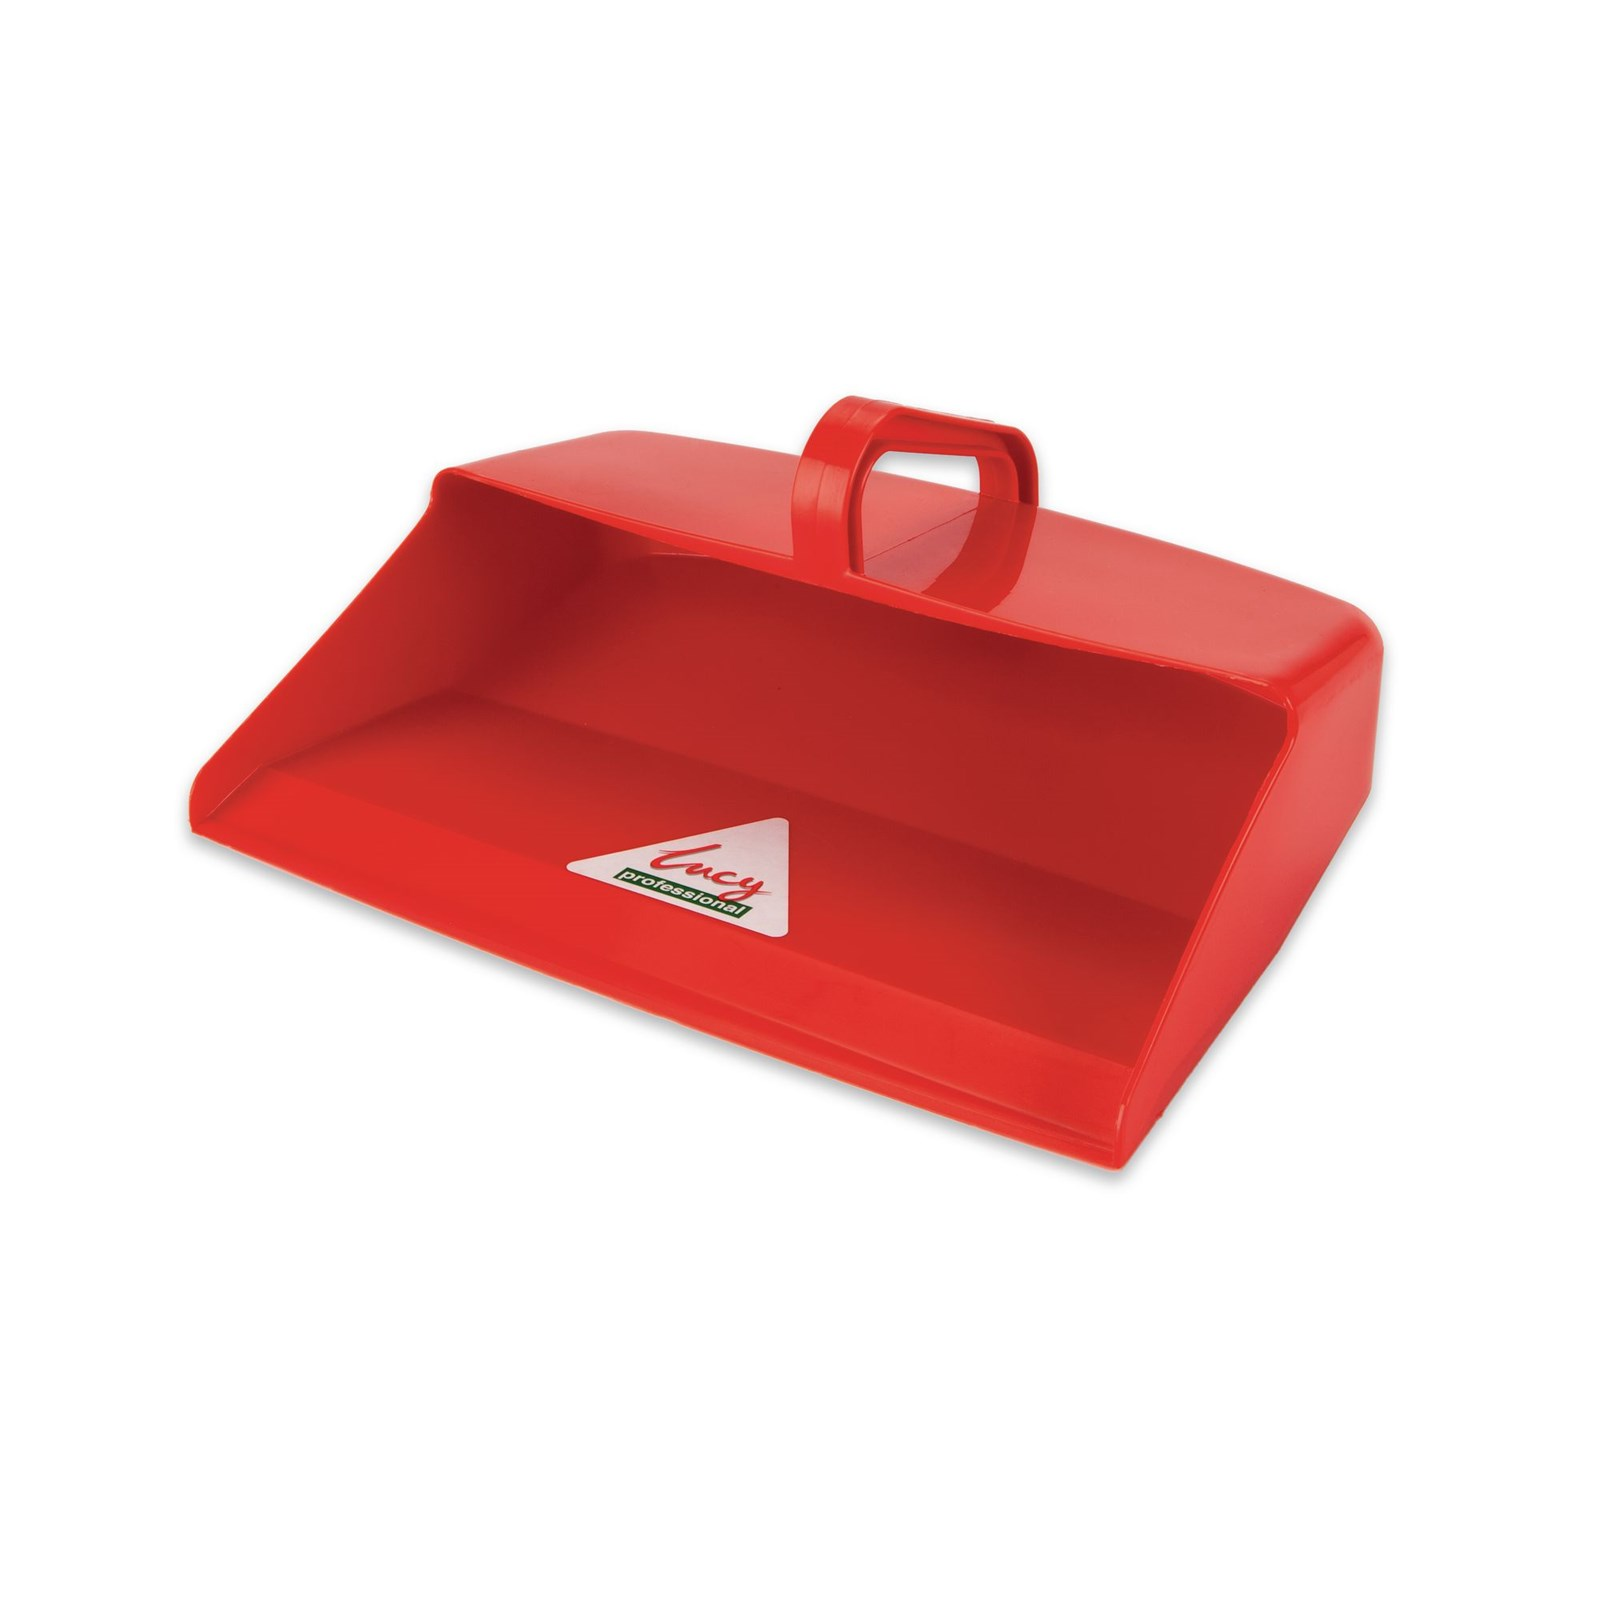 Dustpan - Red